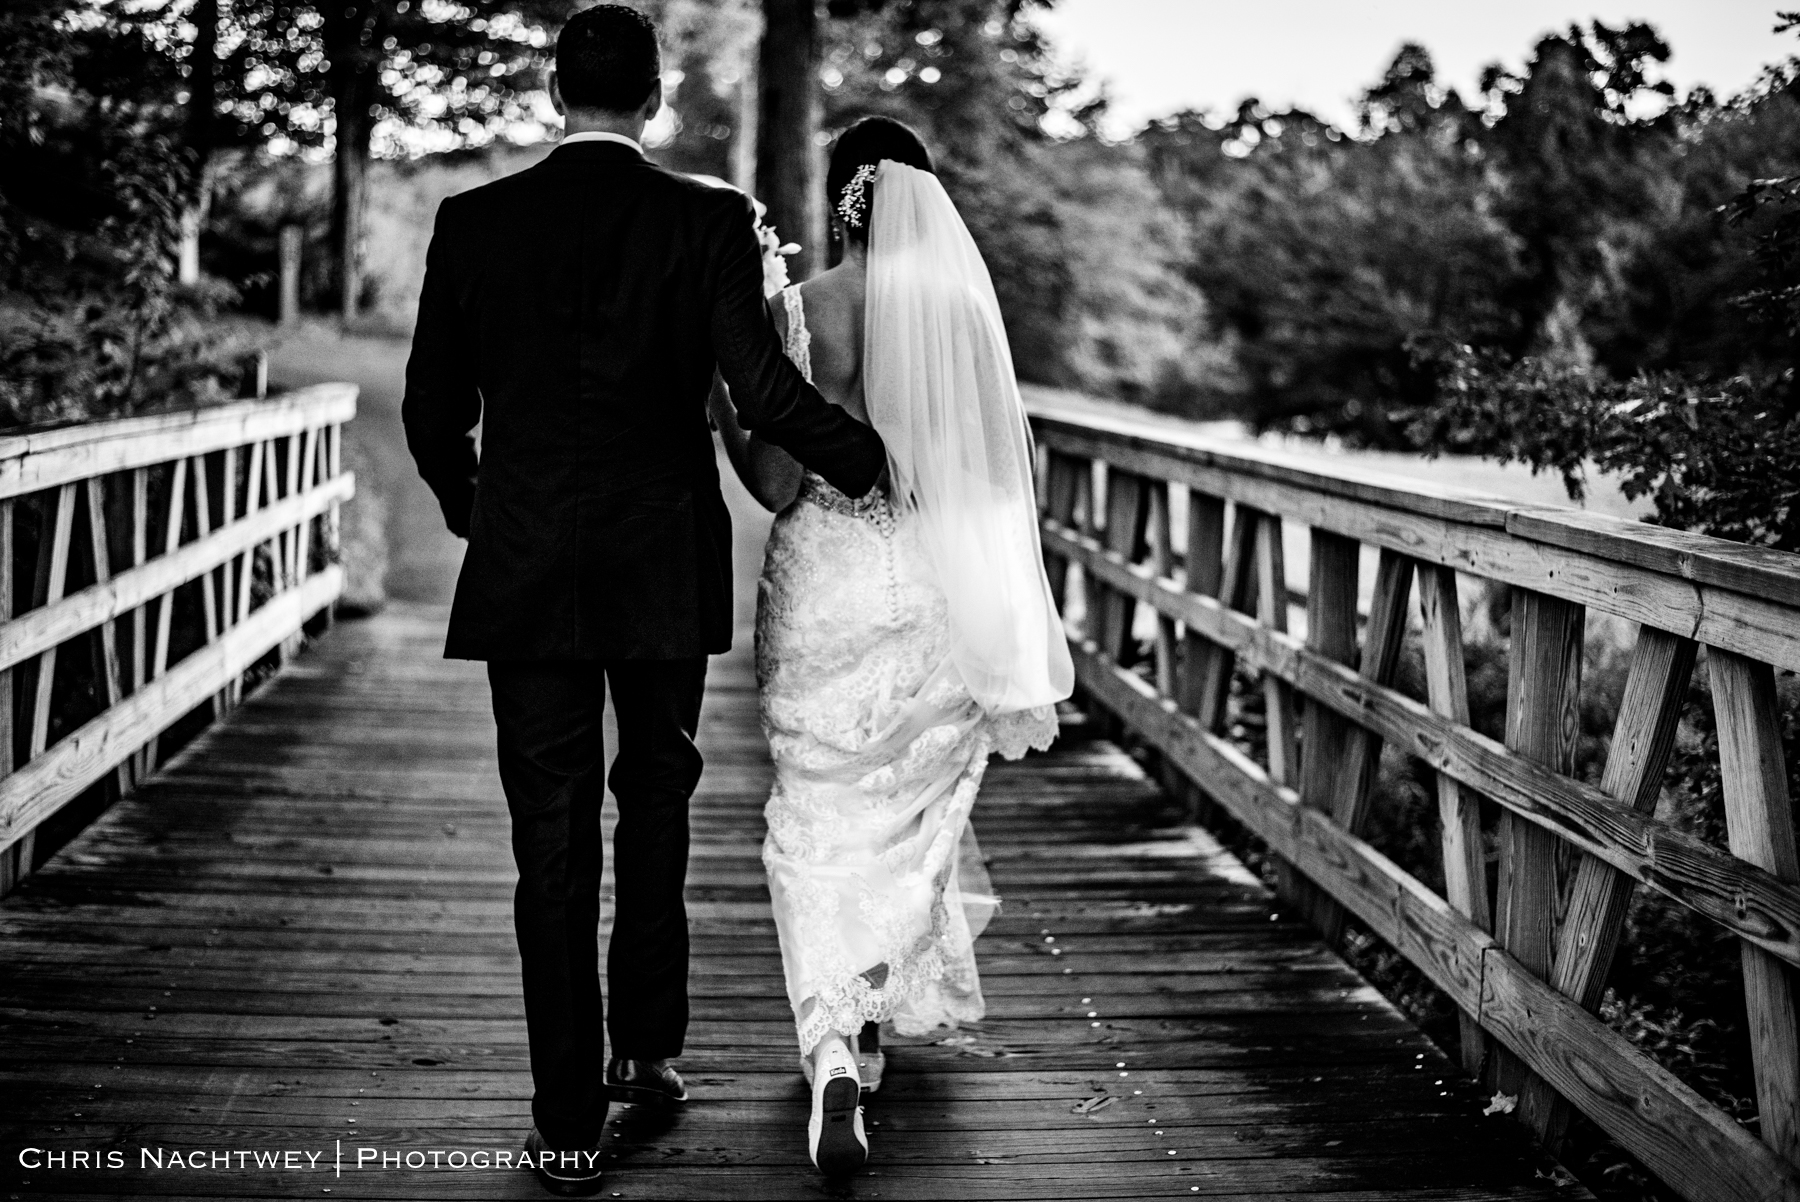 wedding-lake-of-isles-photos-chris-nachtwey-photography-2019-43.jpg